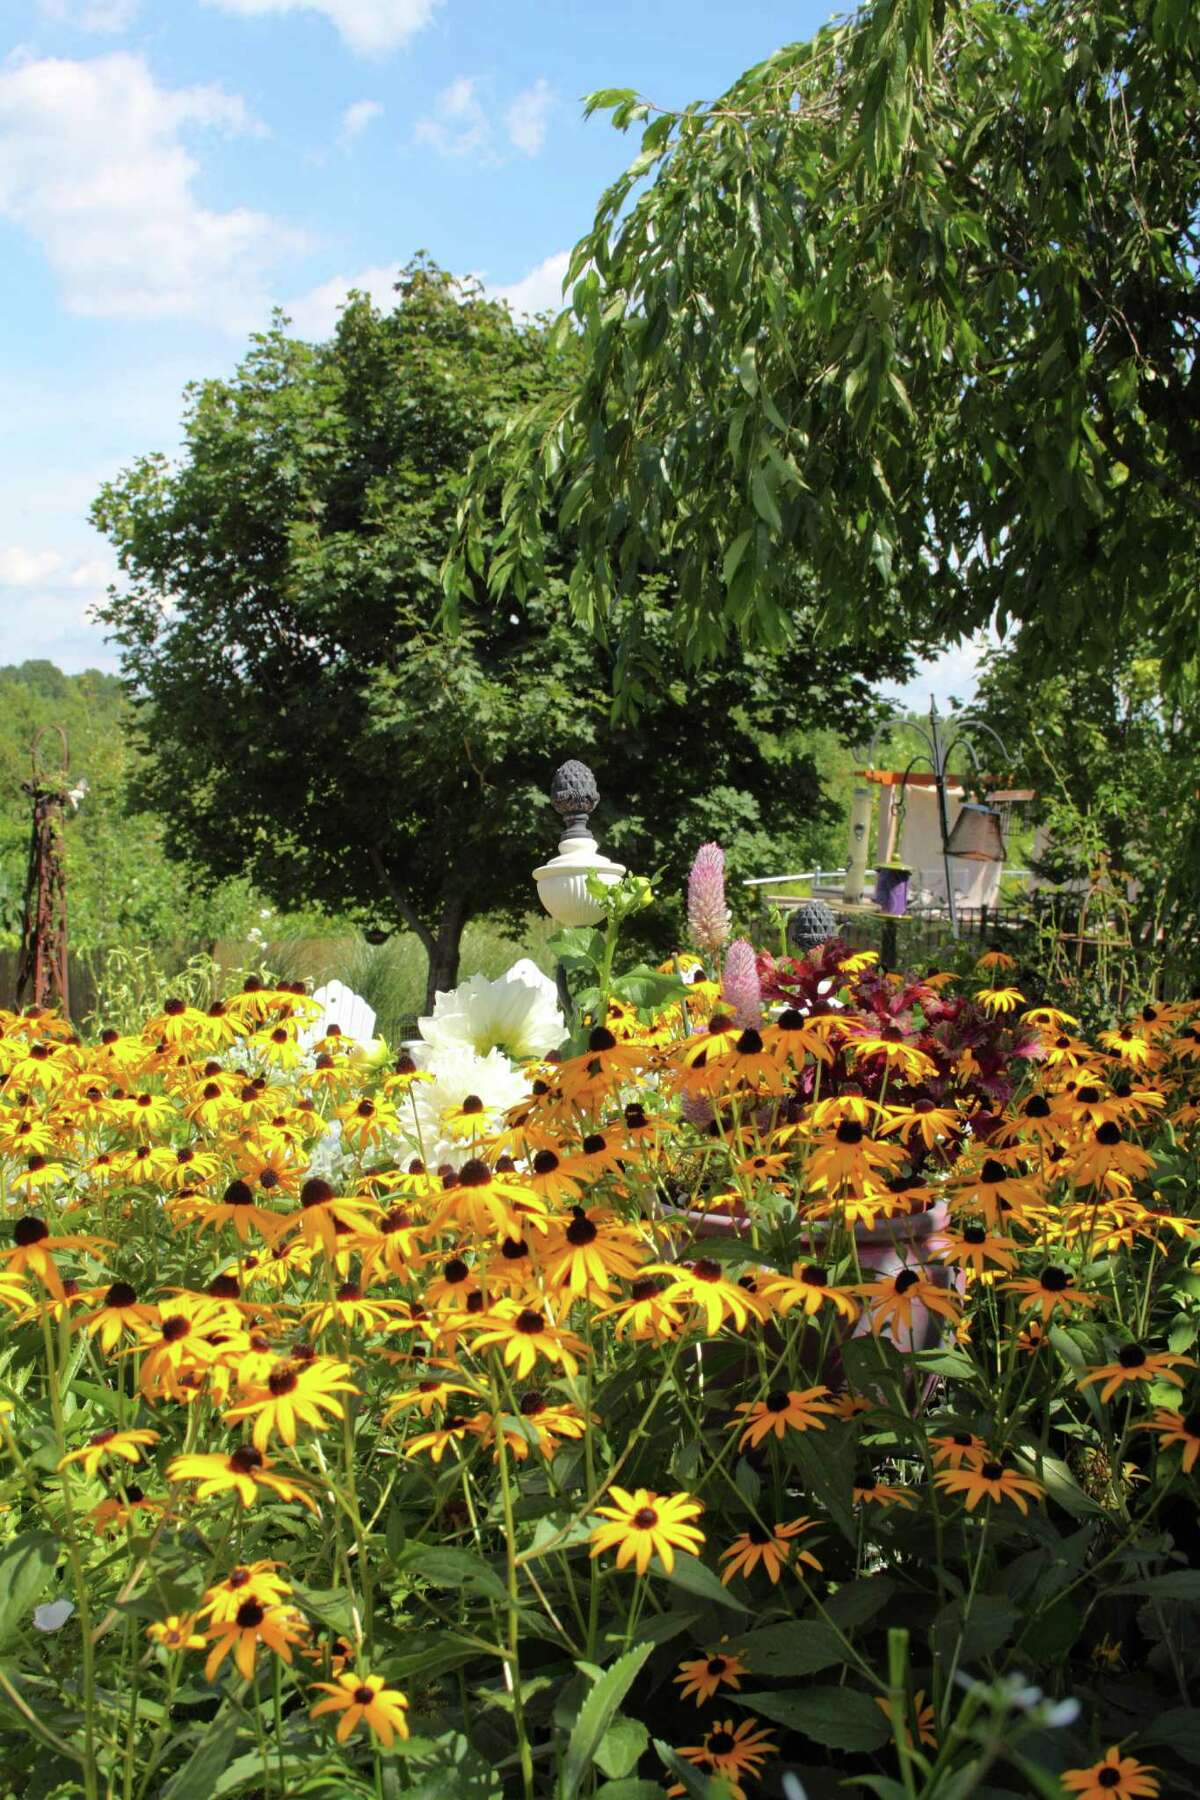 Denise and Don Maurer's garden in Troy